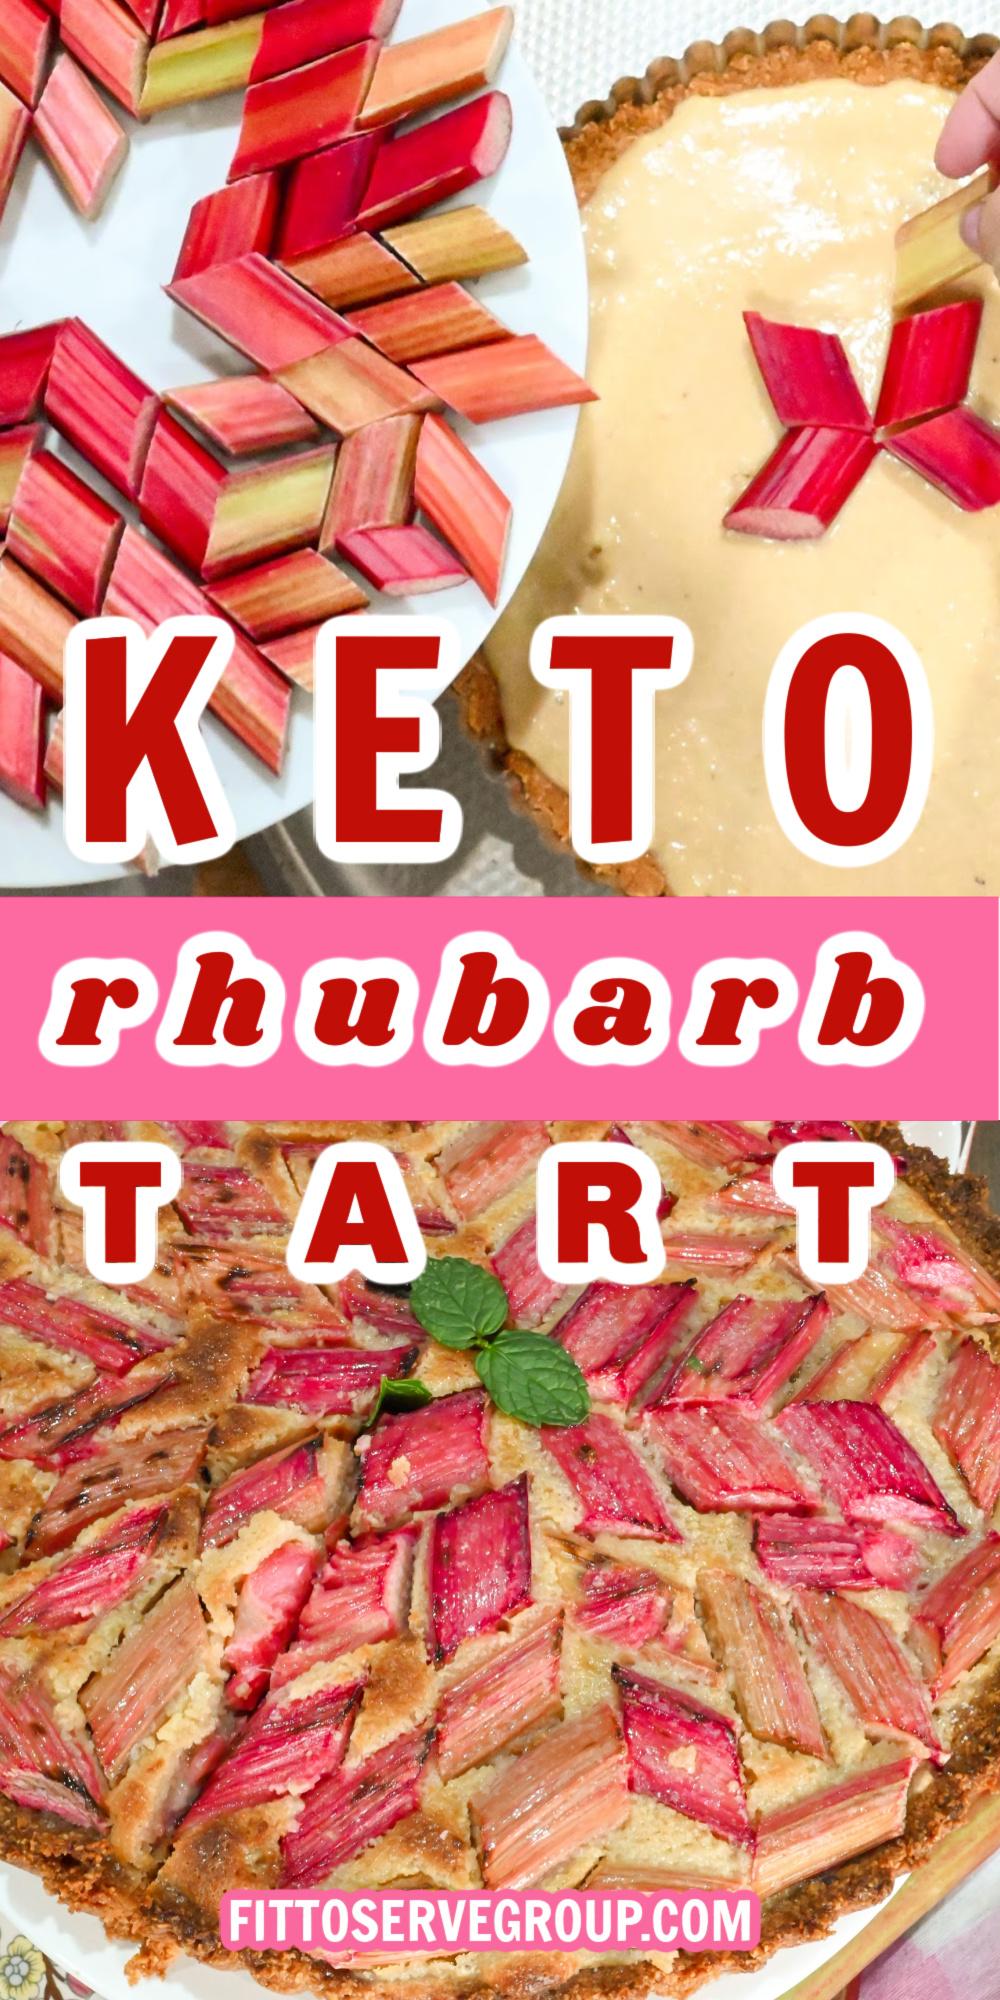 keto rhubarb tart with frangipane filling